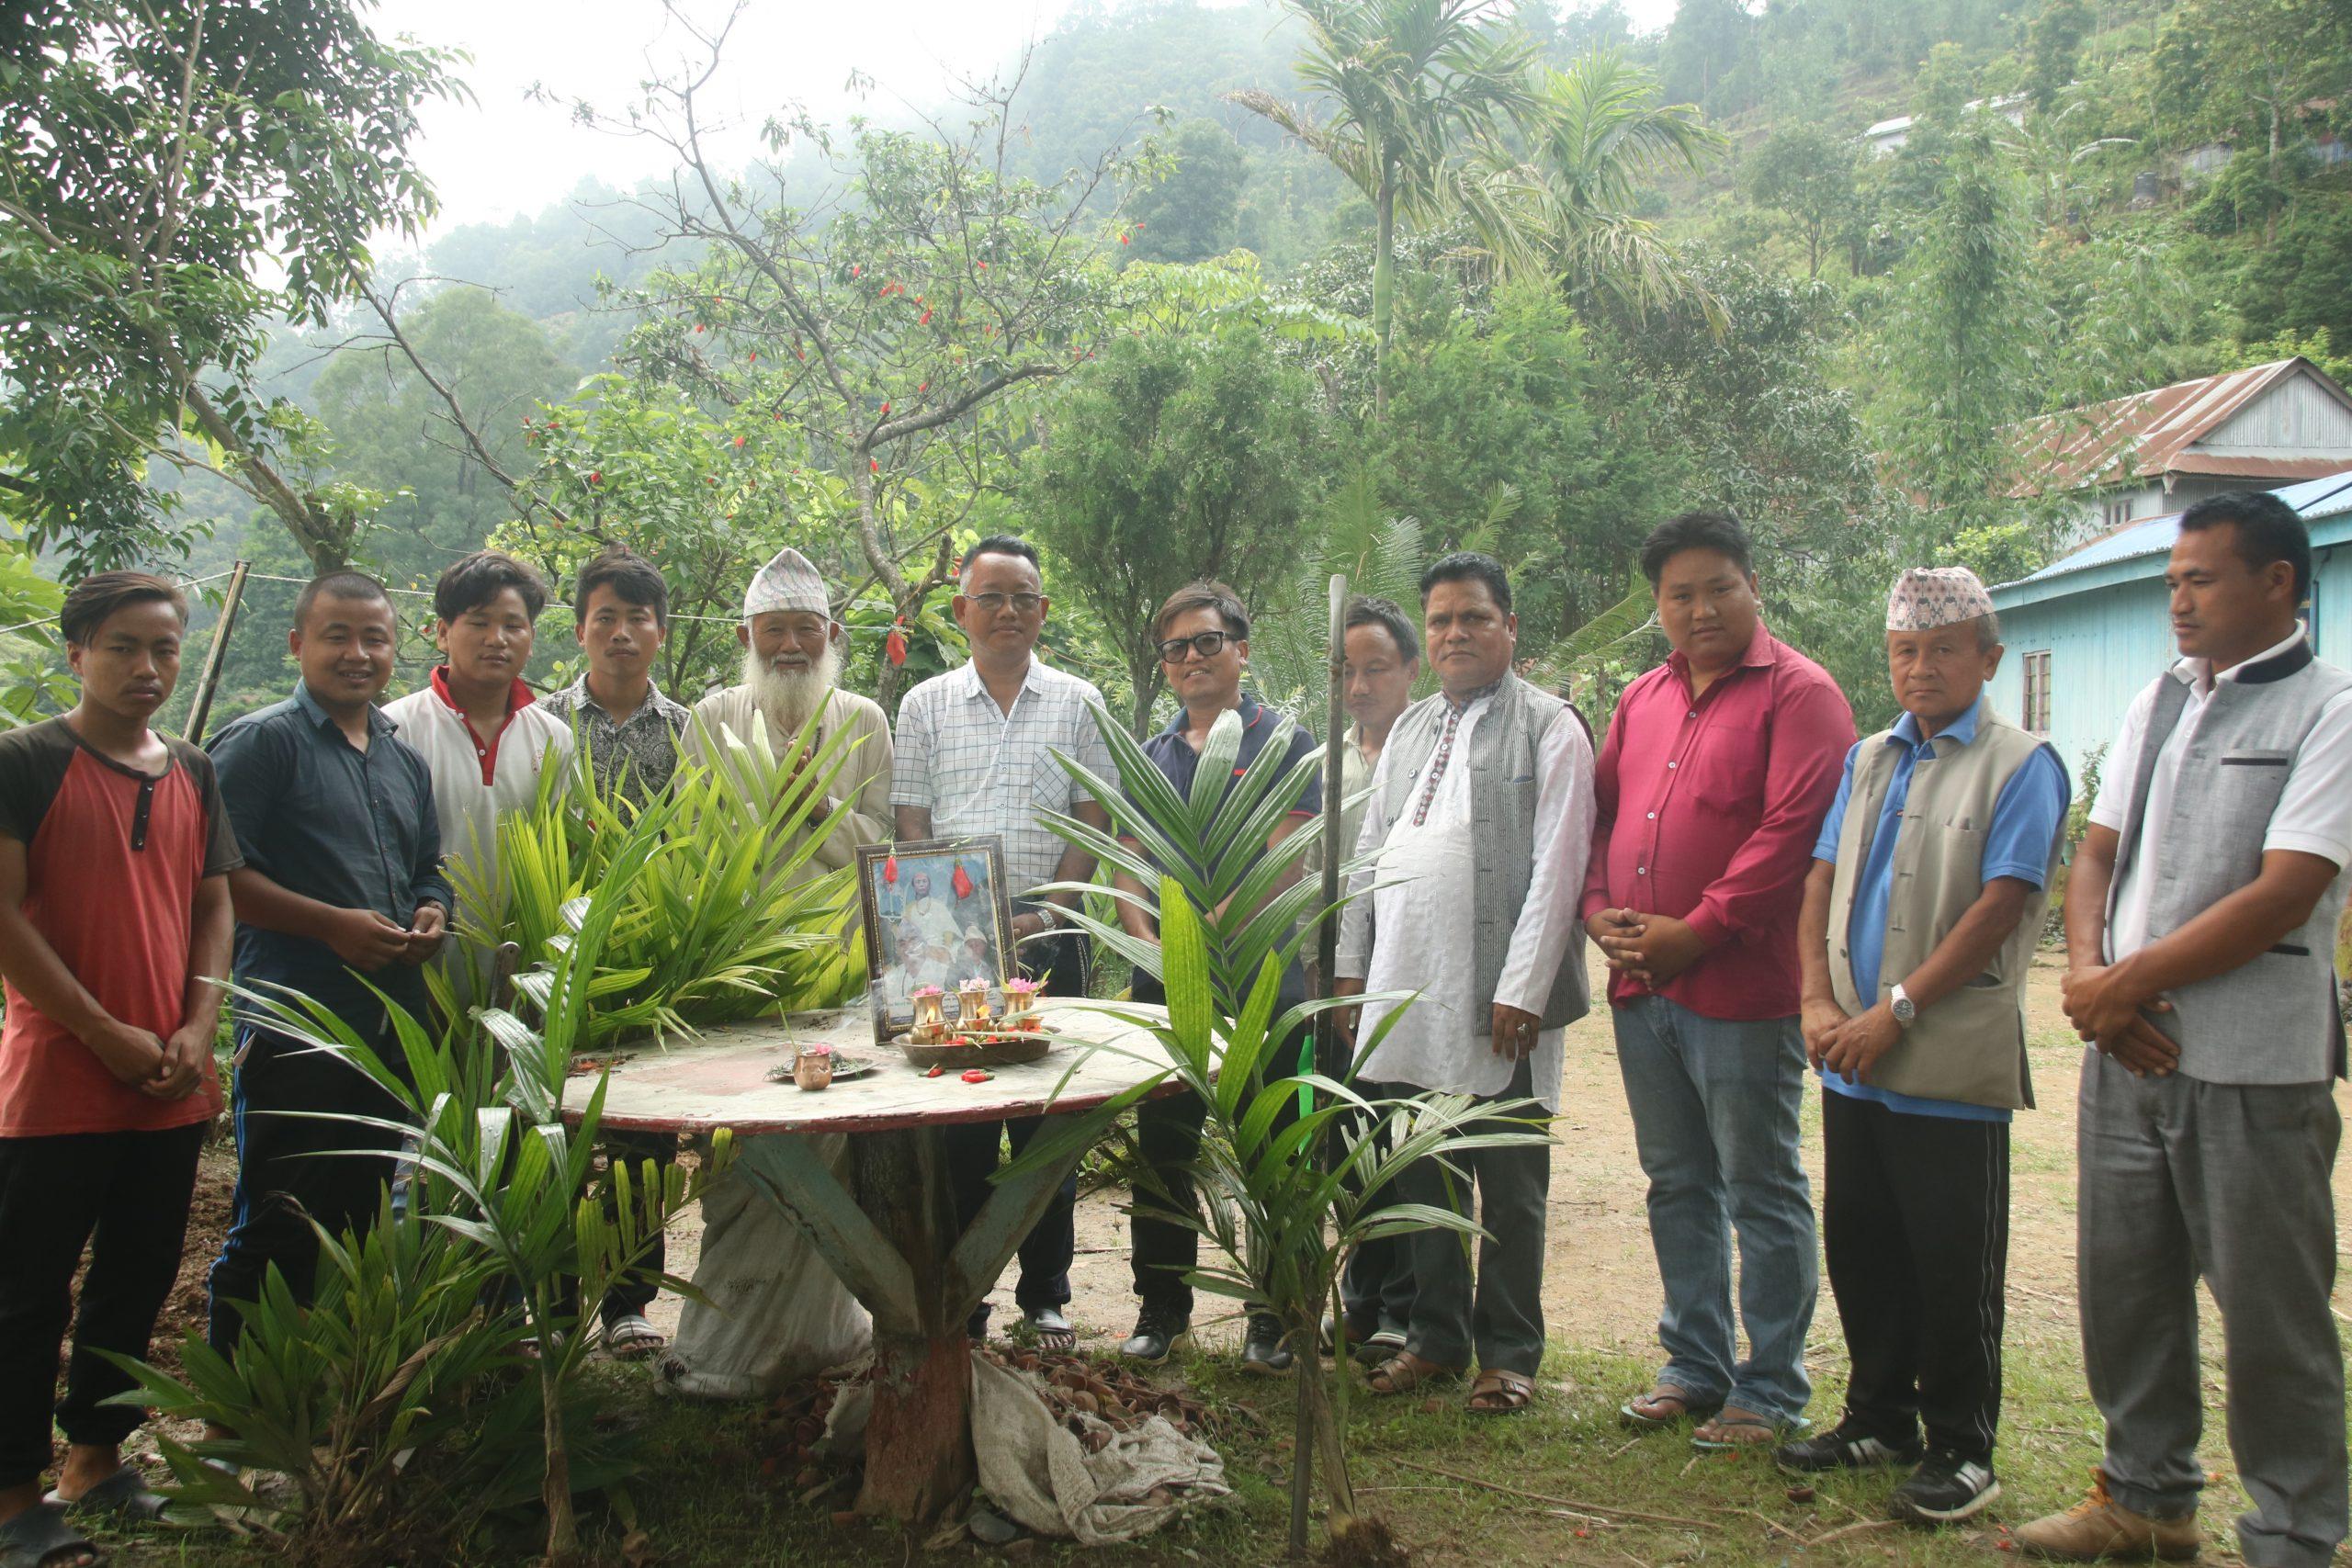 'नालीफूङवाद्धारा माङसेबुङ परिसरमा बृक्षरोपण(फोटो फिचर सहित)